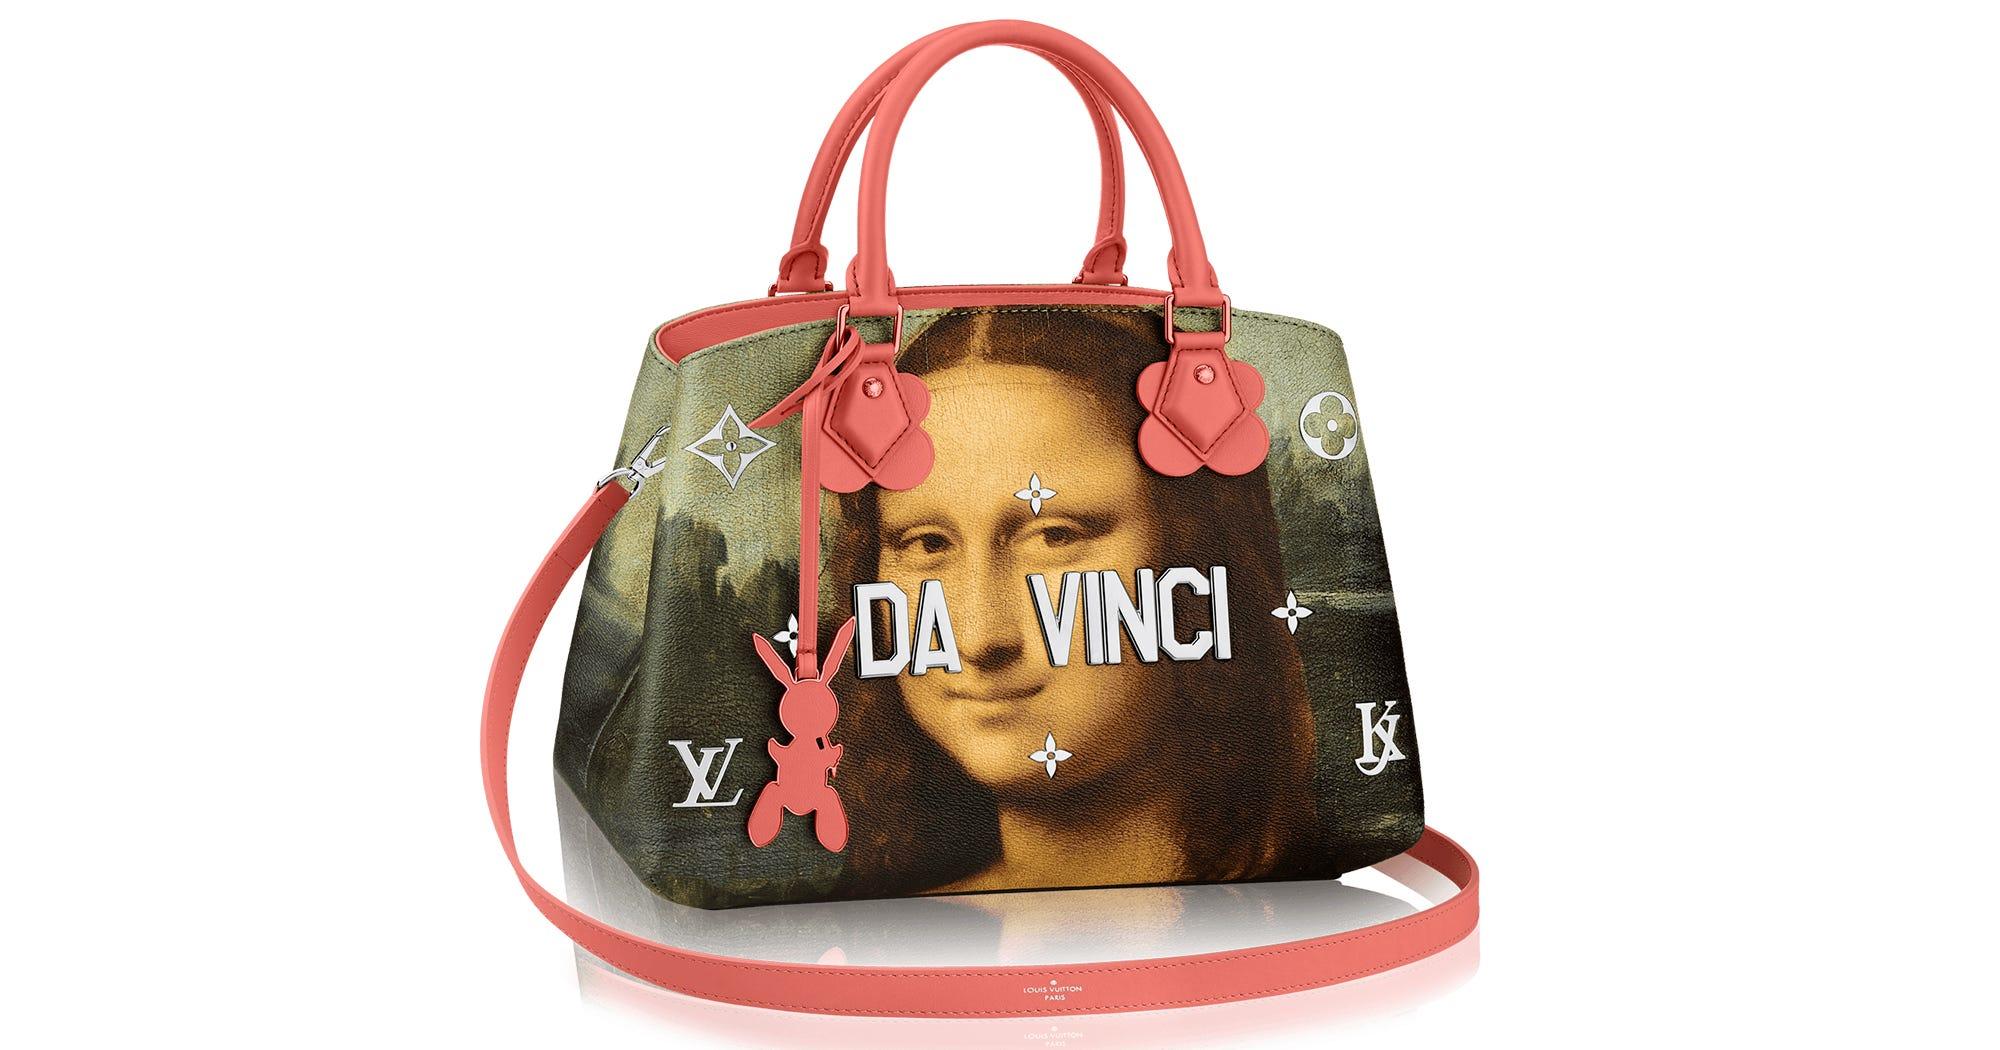 louis vuitton jeff koons collaboration handbags